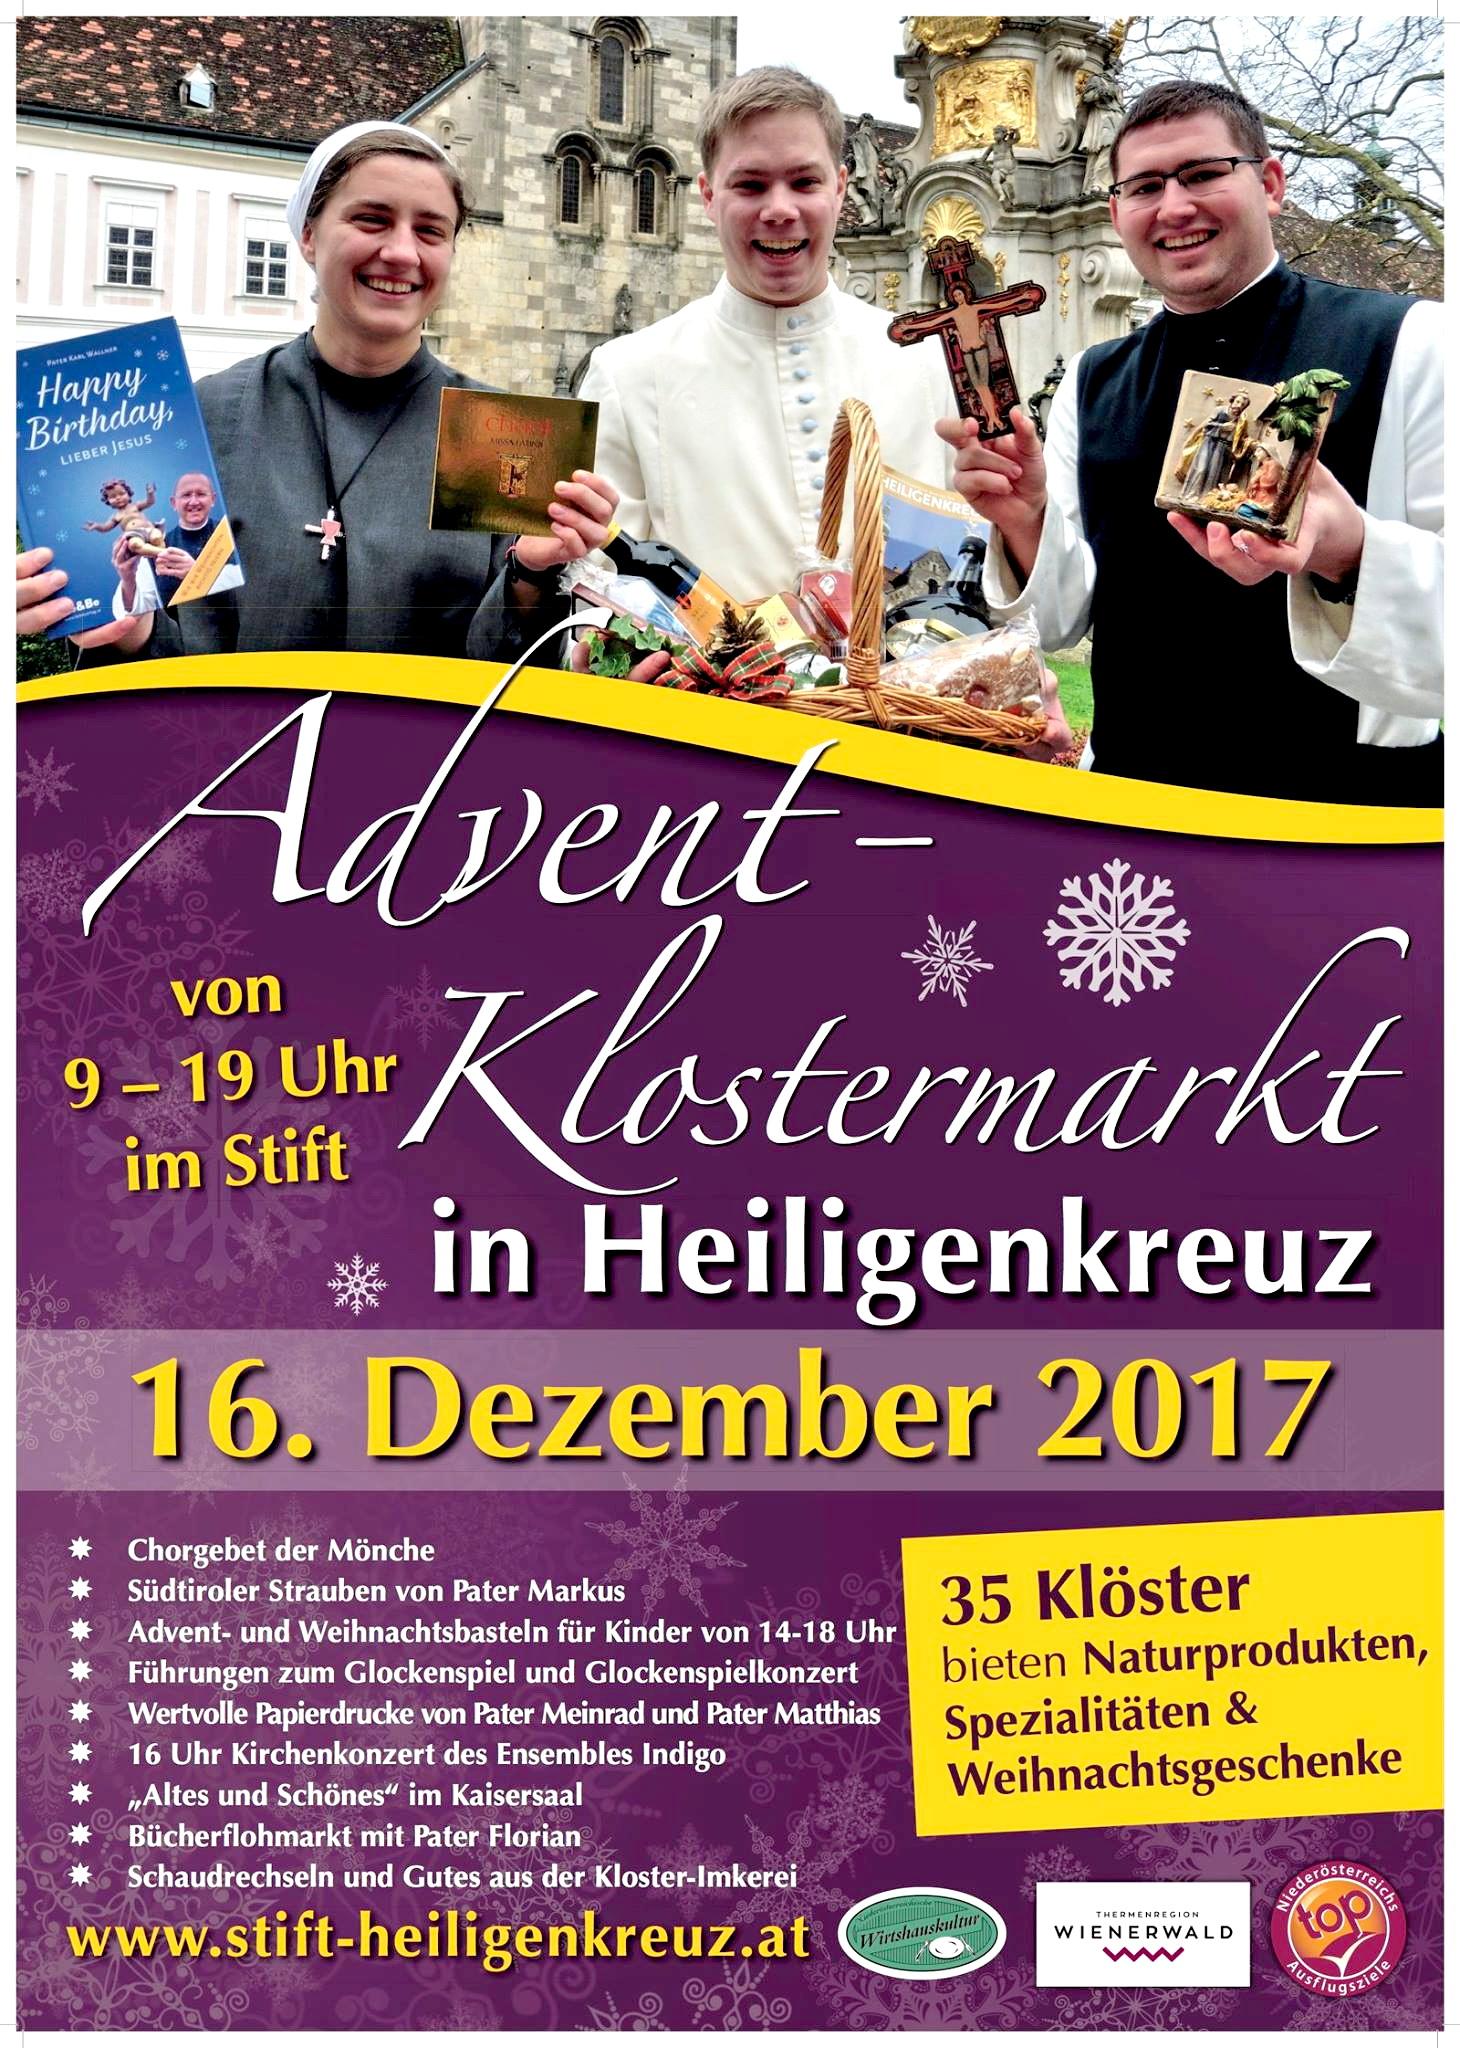 Allgemein Archive - Phil.-Theol. Hochschule Benedikt XVI. Heiligenkreuz